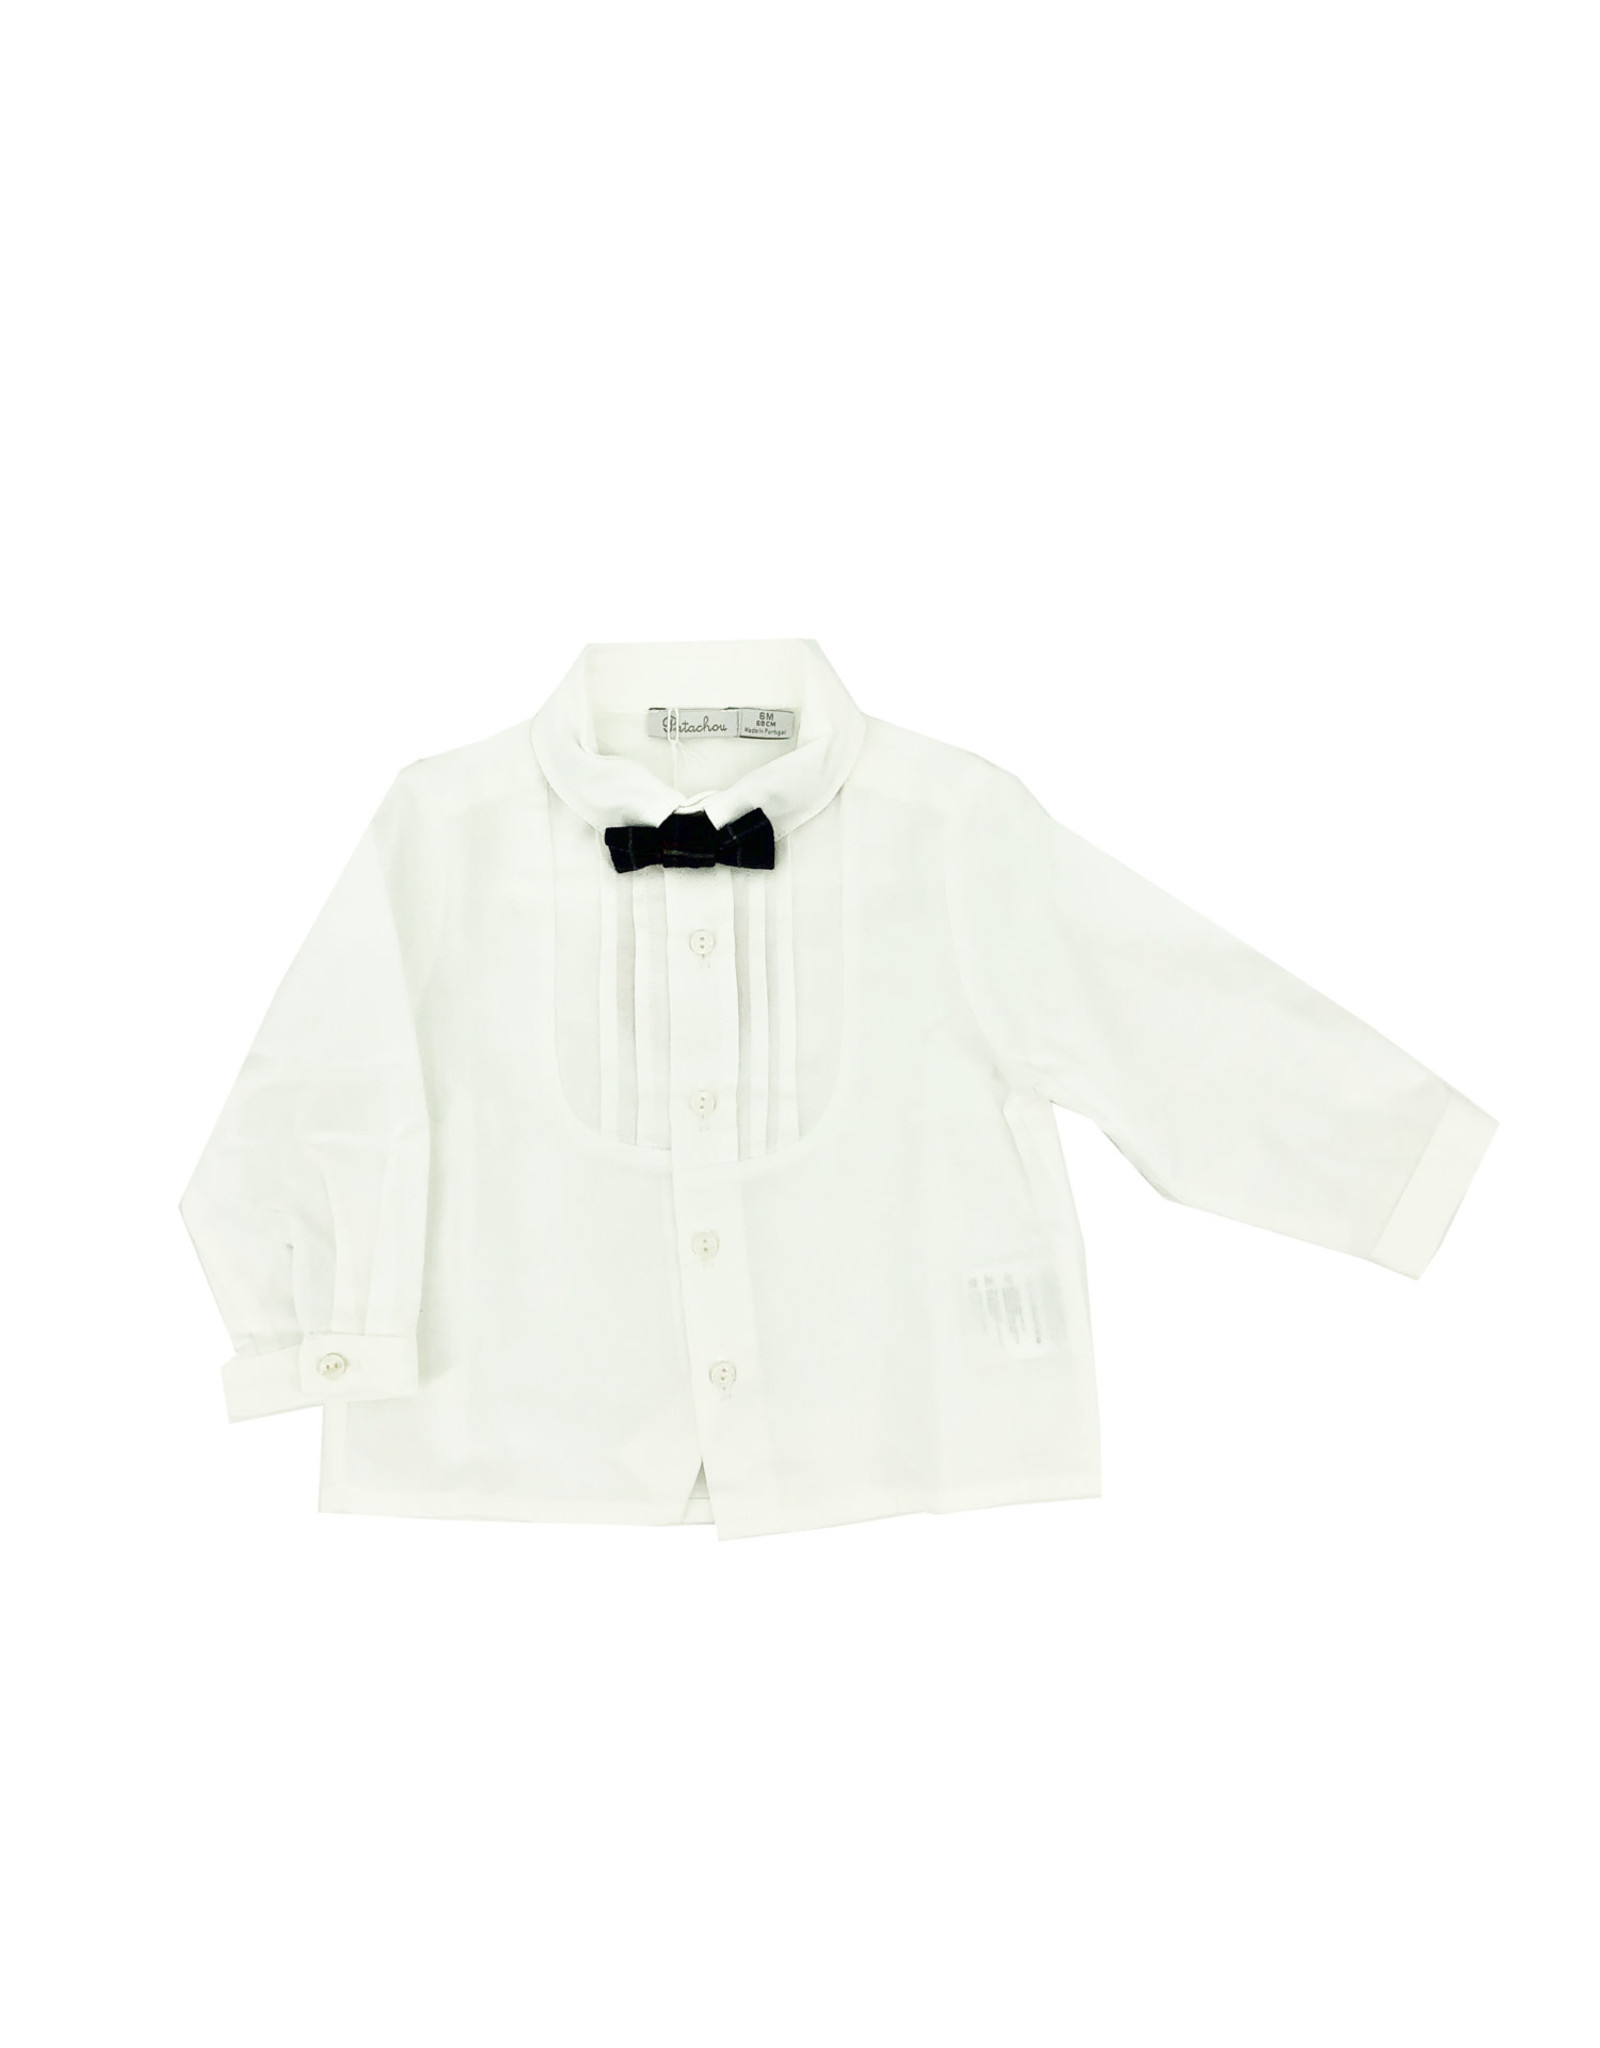 PATACHOU Boy shirt navy check